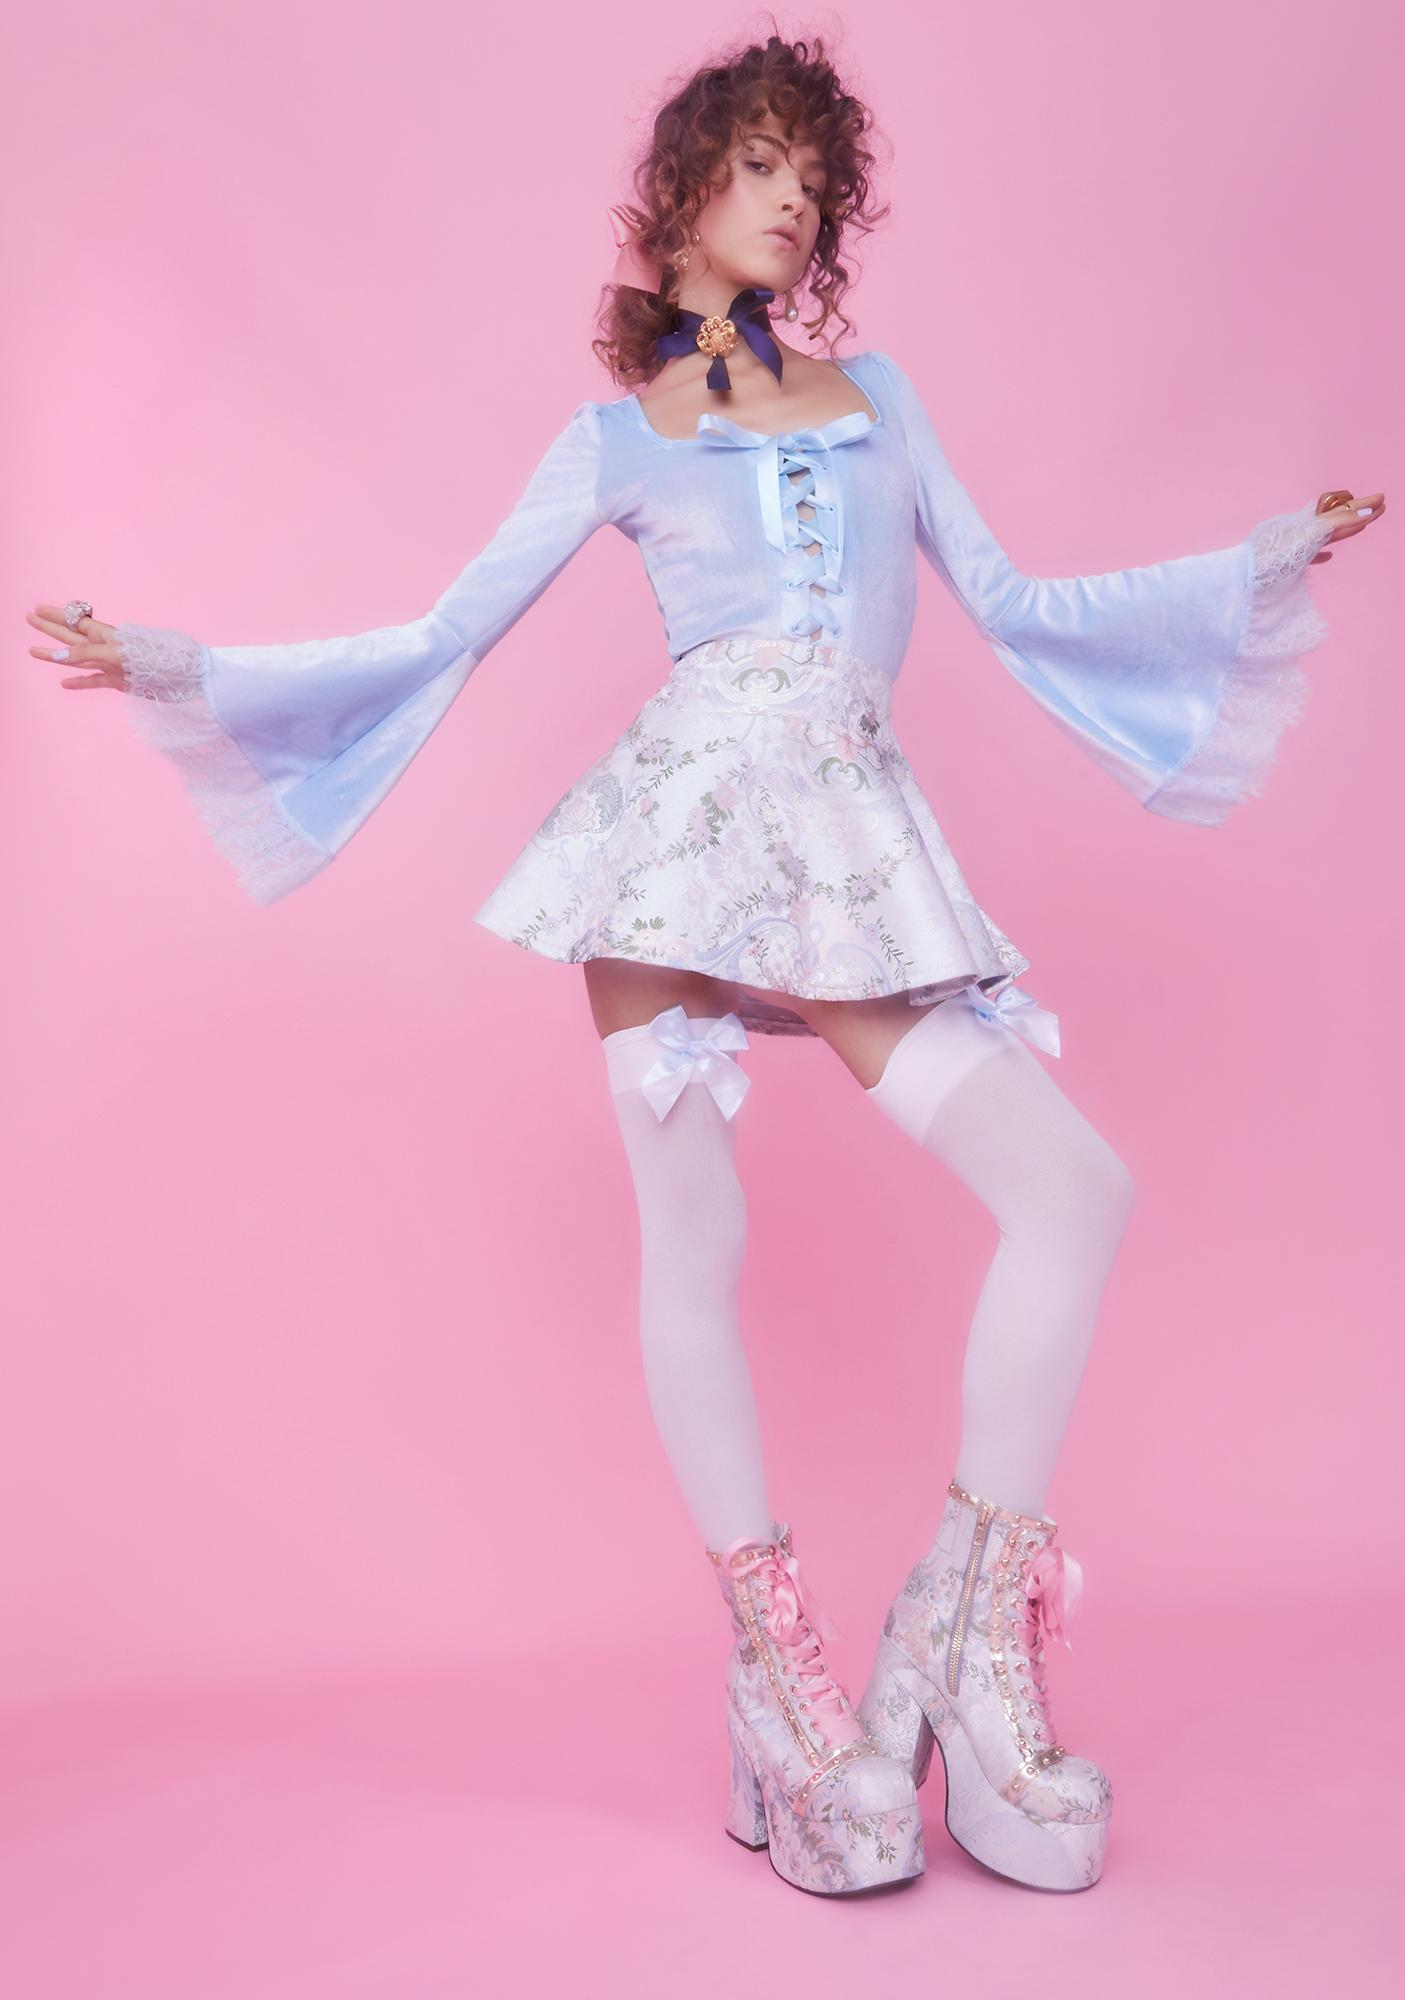 Sugar Thrillz Dreams Do Come True Velvet Top